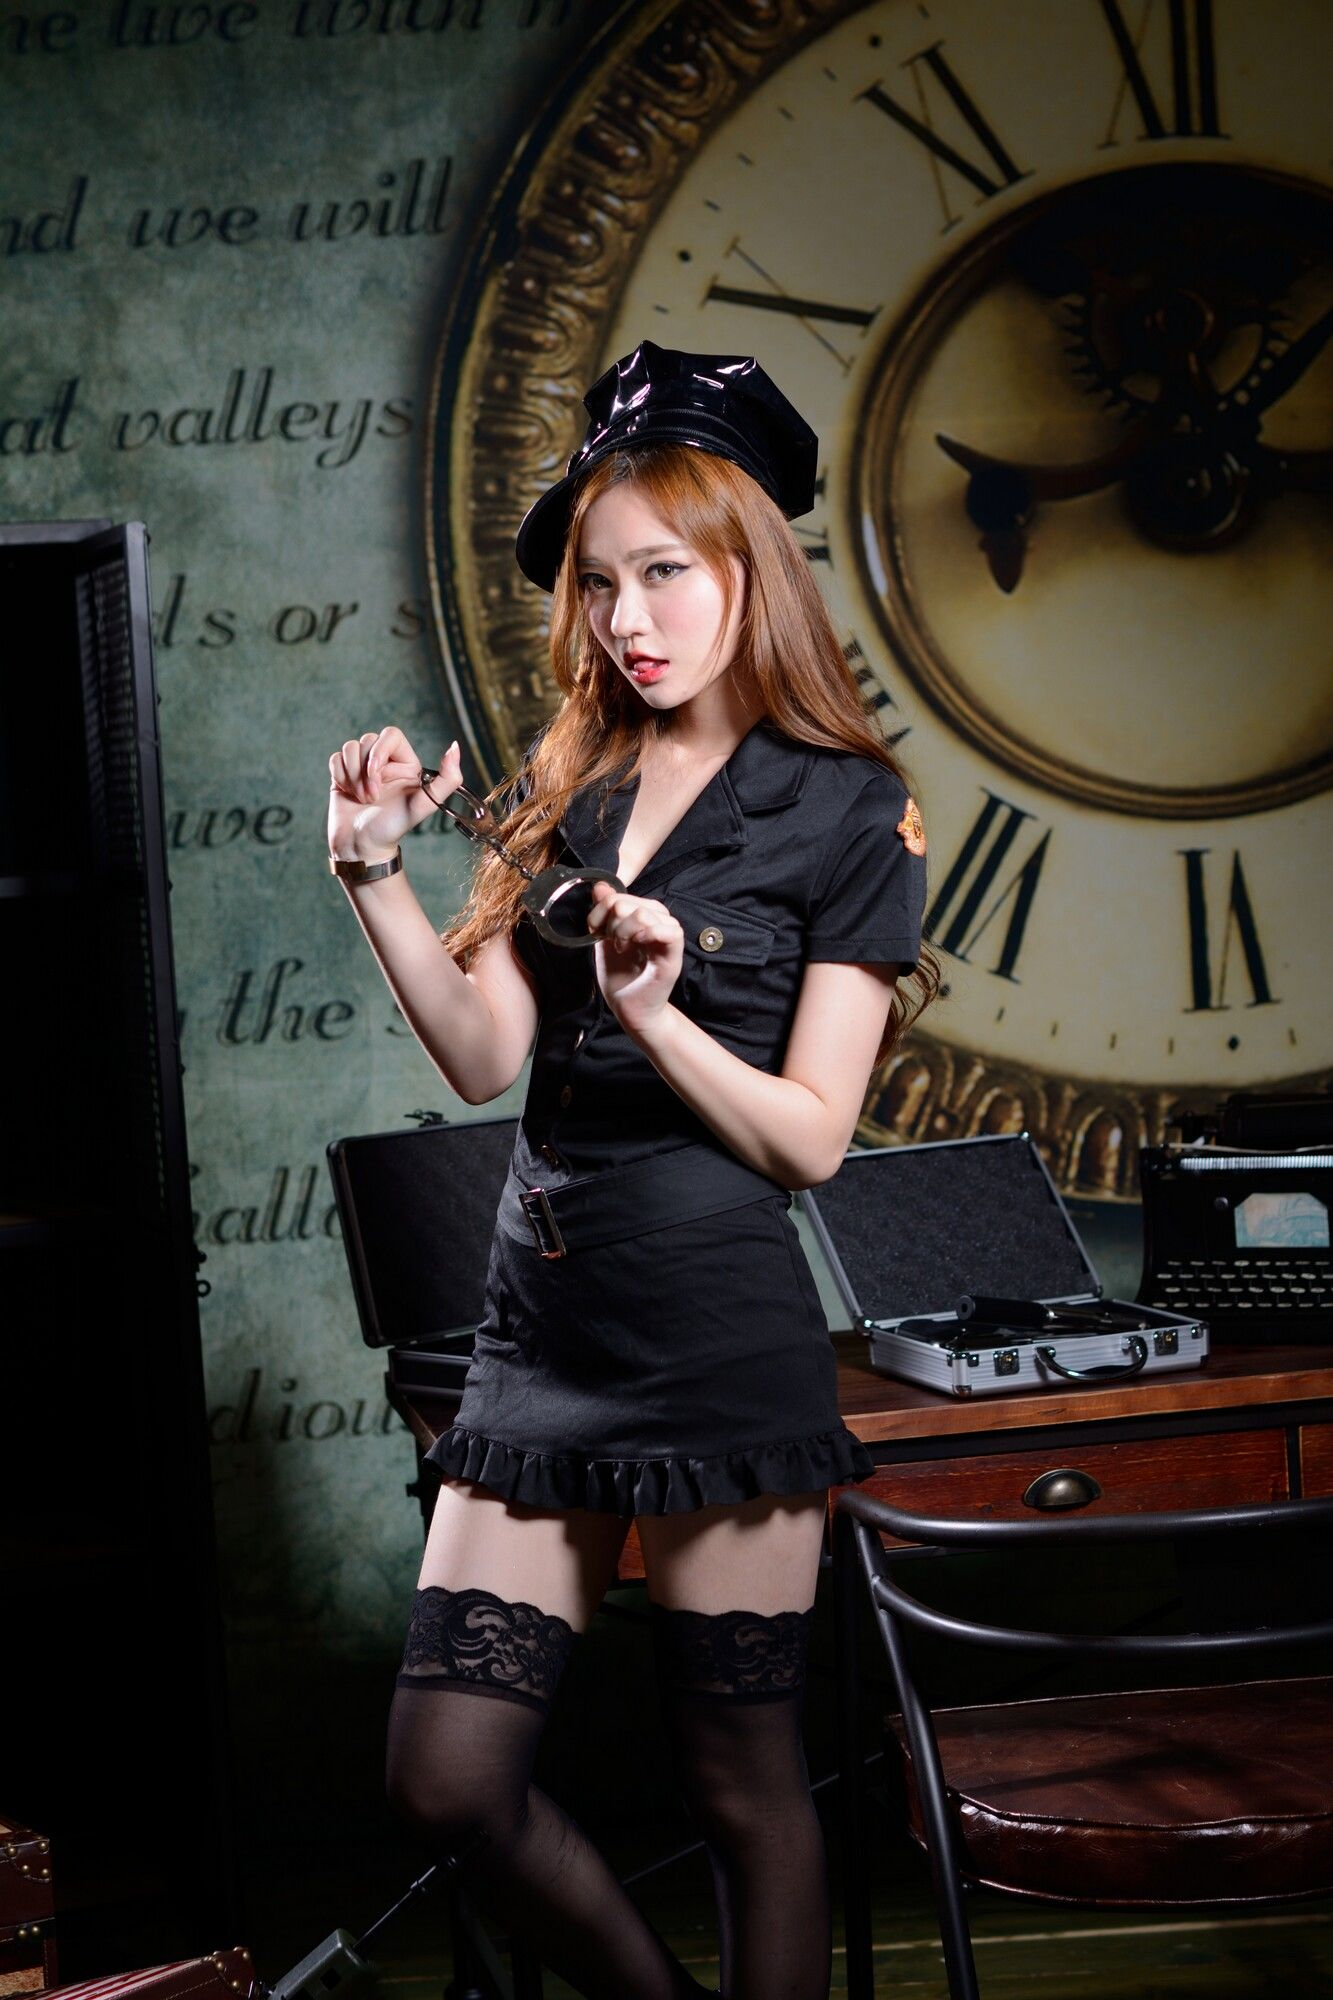 VOL.1893 [台湾正妹]捆绑绳艺黑丝女警:苏小立超高清个人性感漂亮大图(50P)